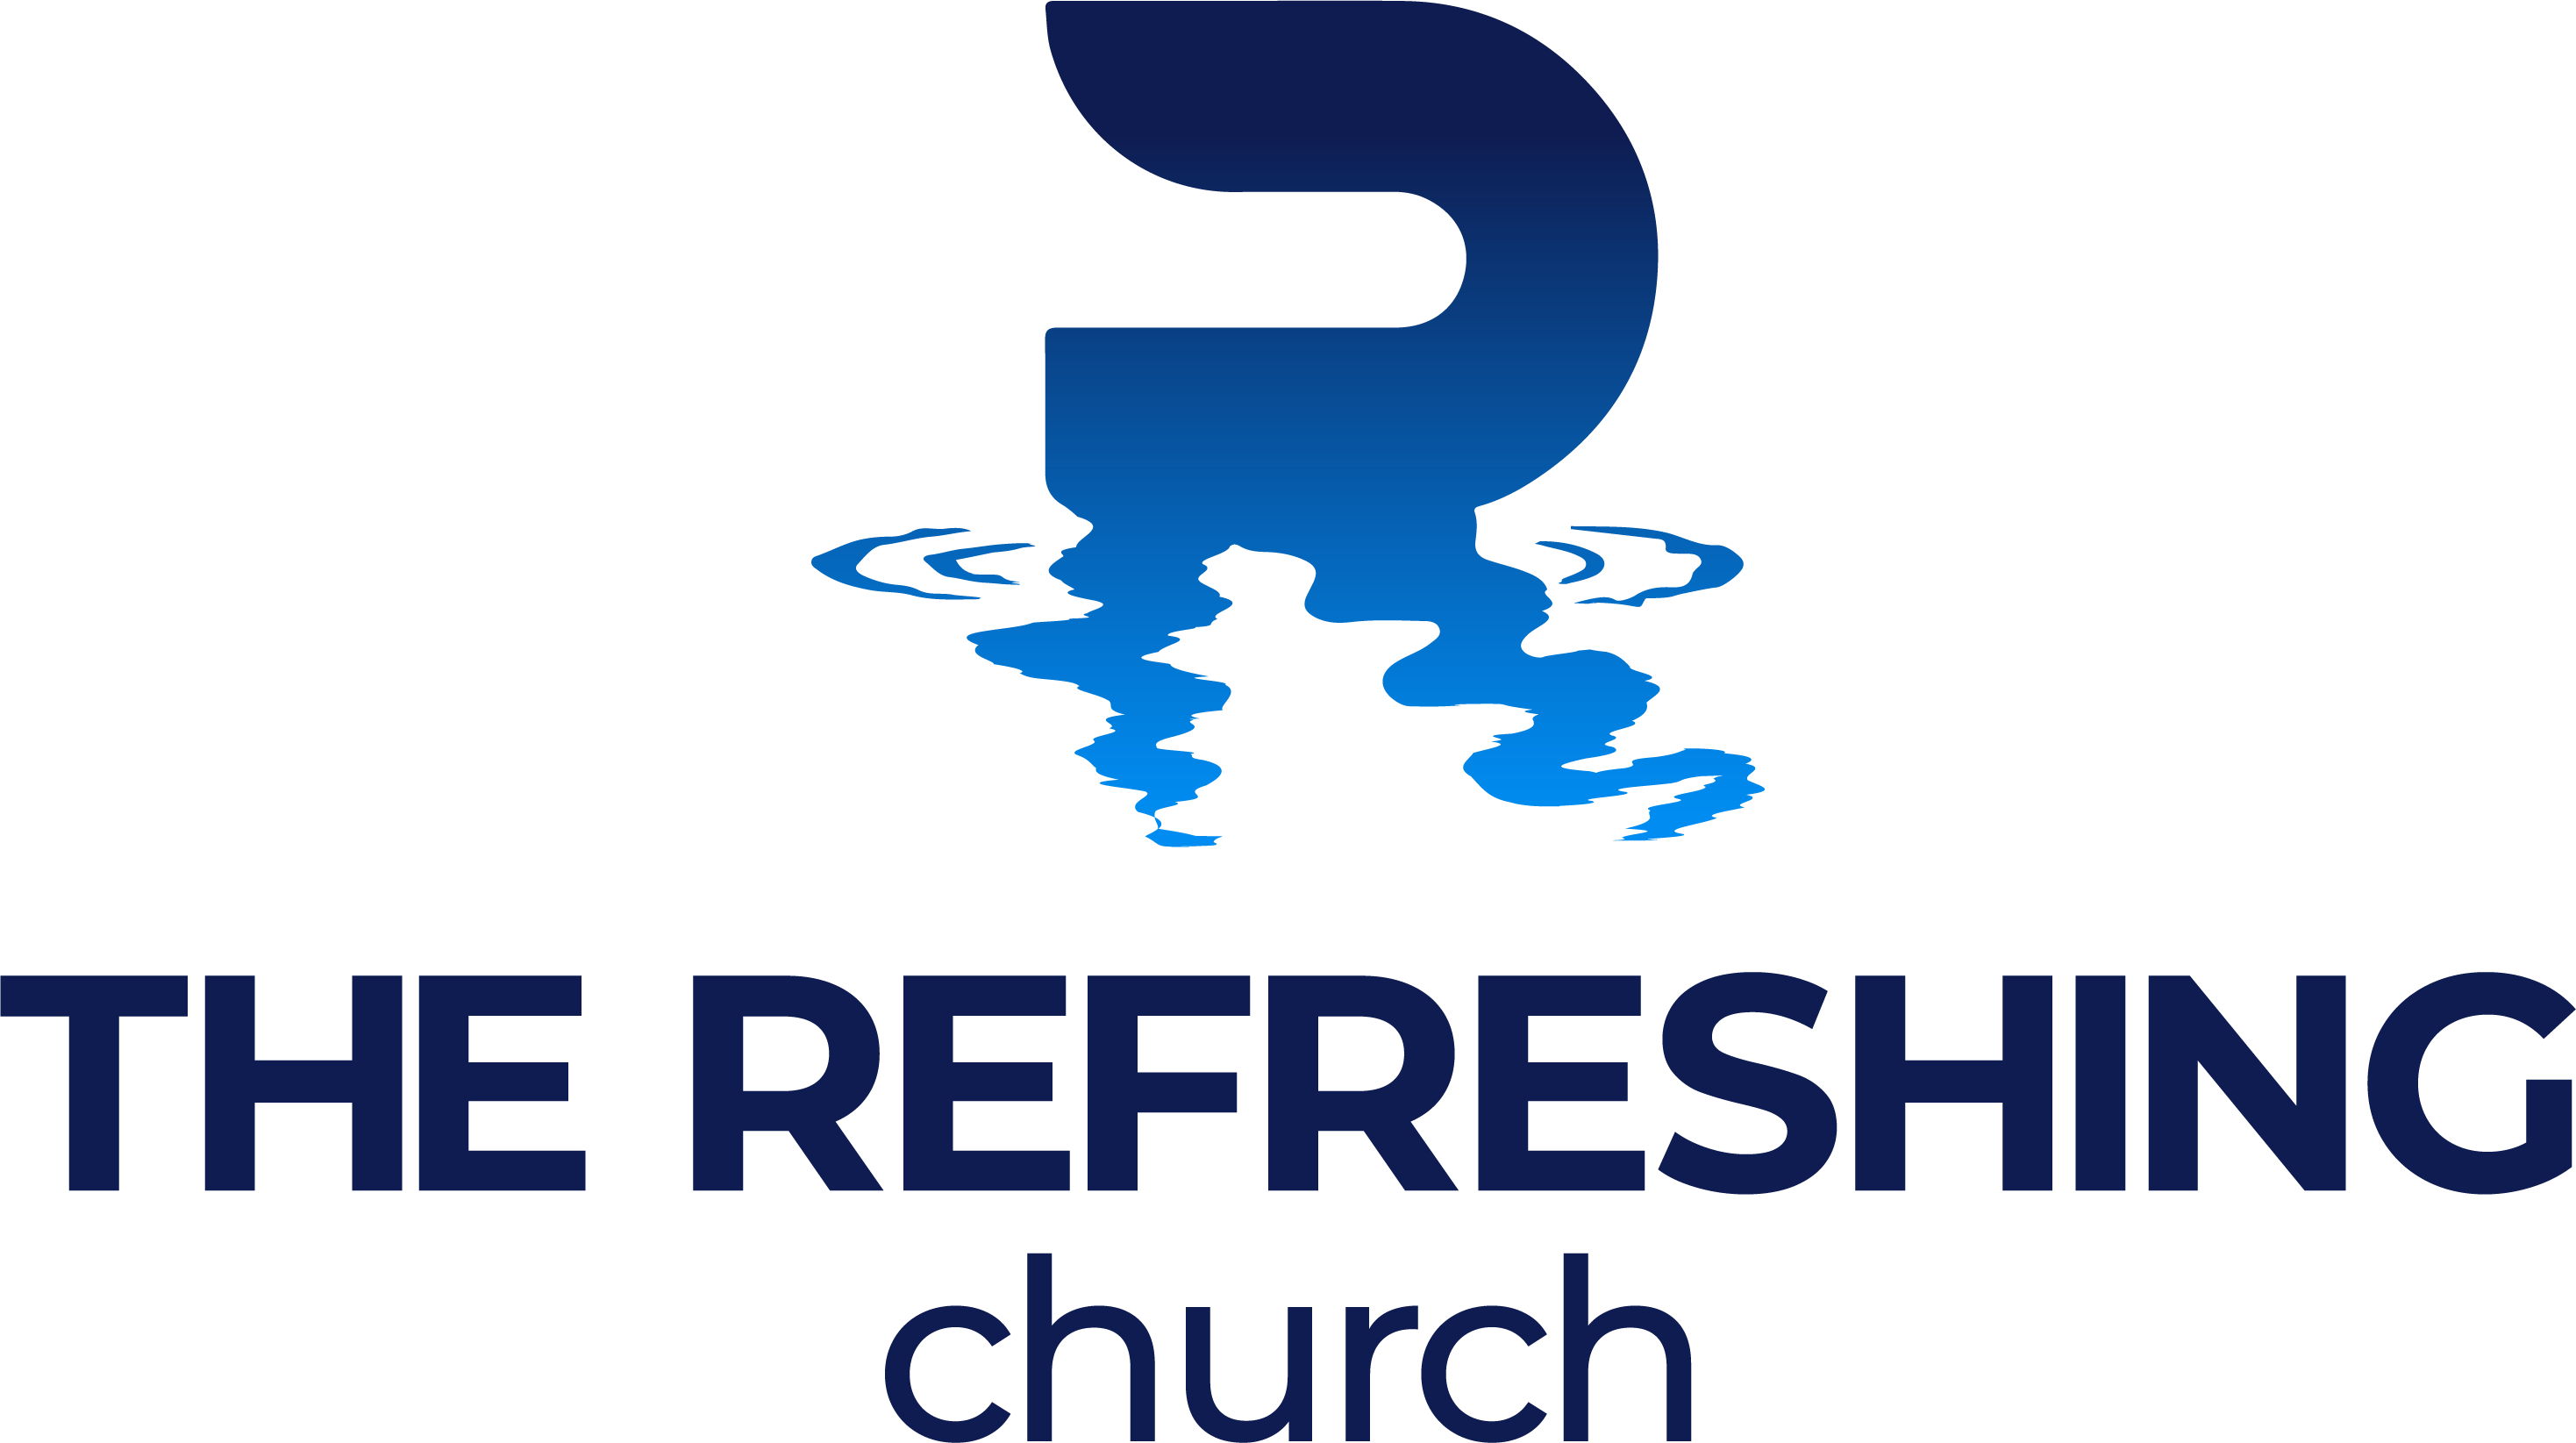 The Refreshing Church